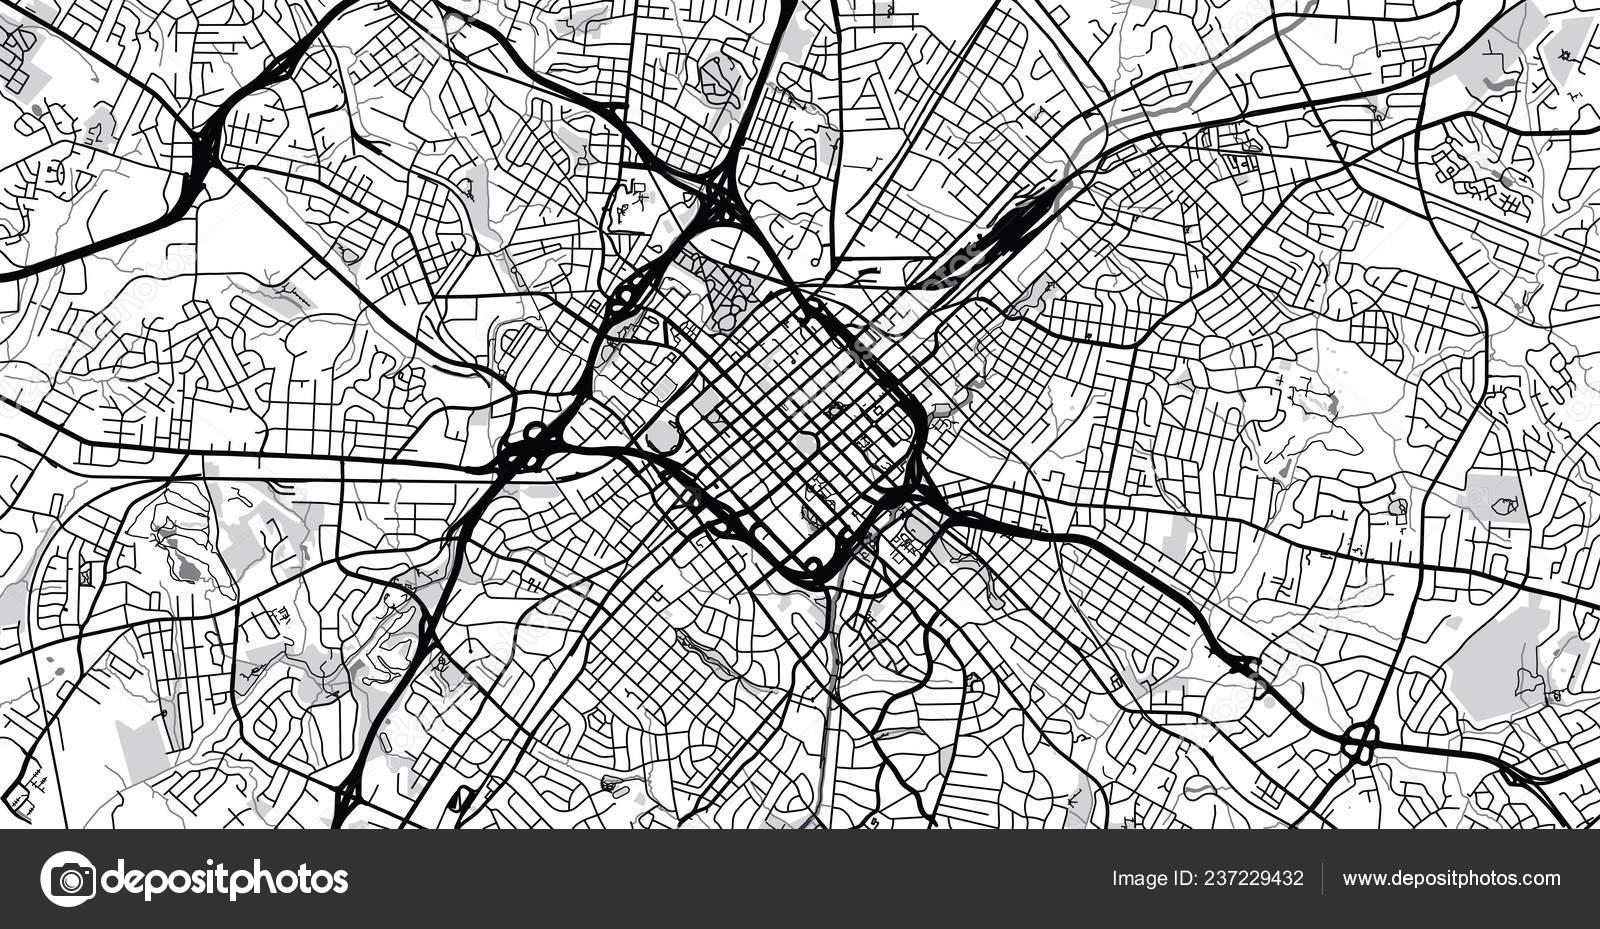 Urban Vector City Map Charlotte North Carolina United States America on